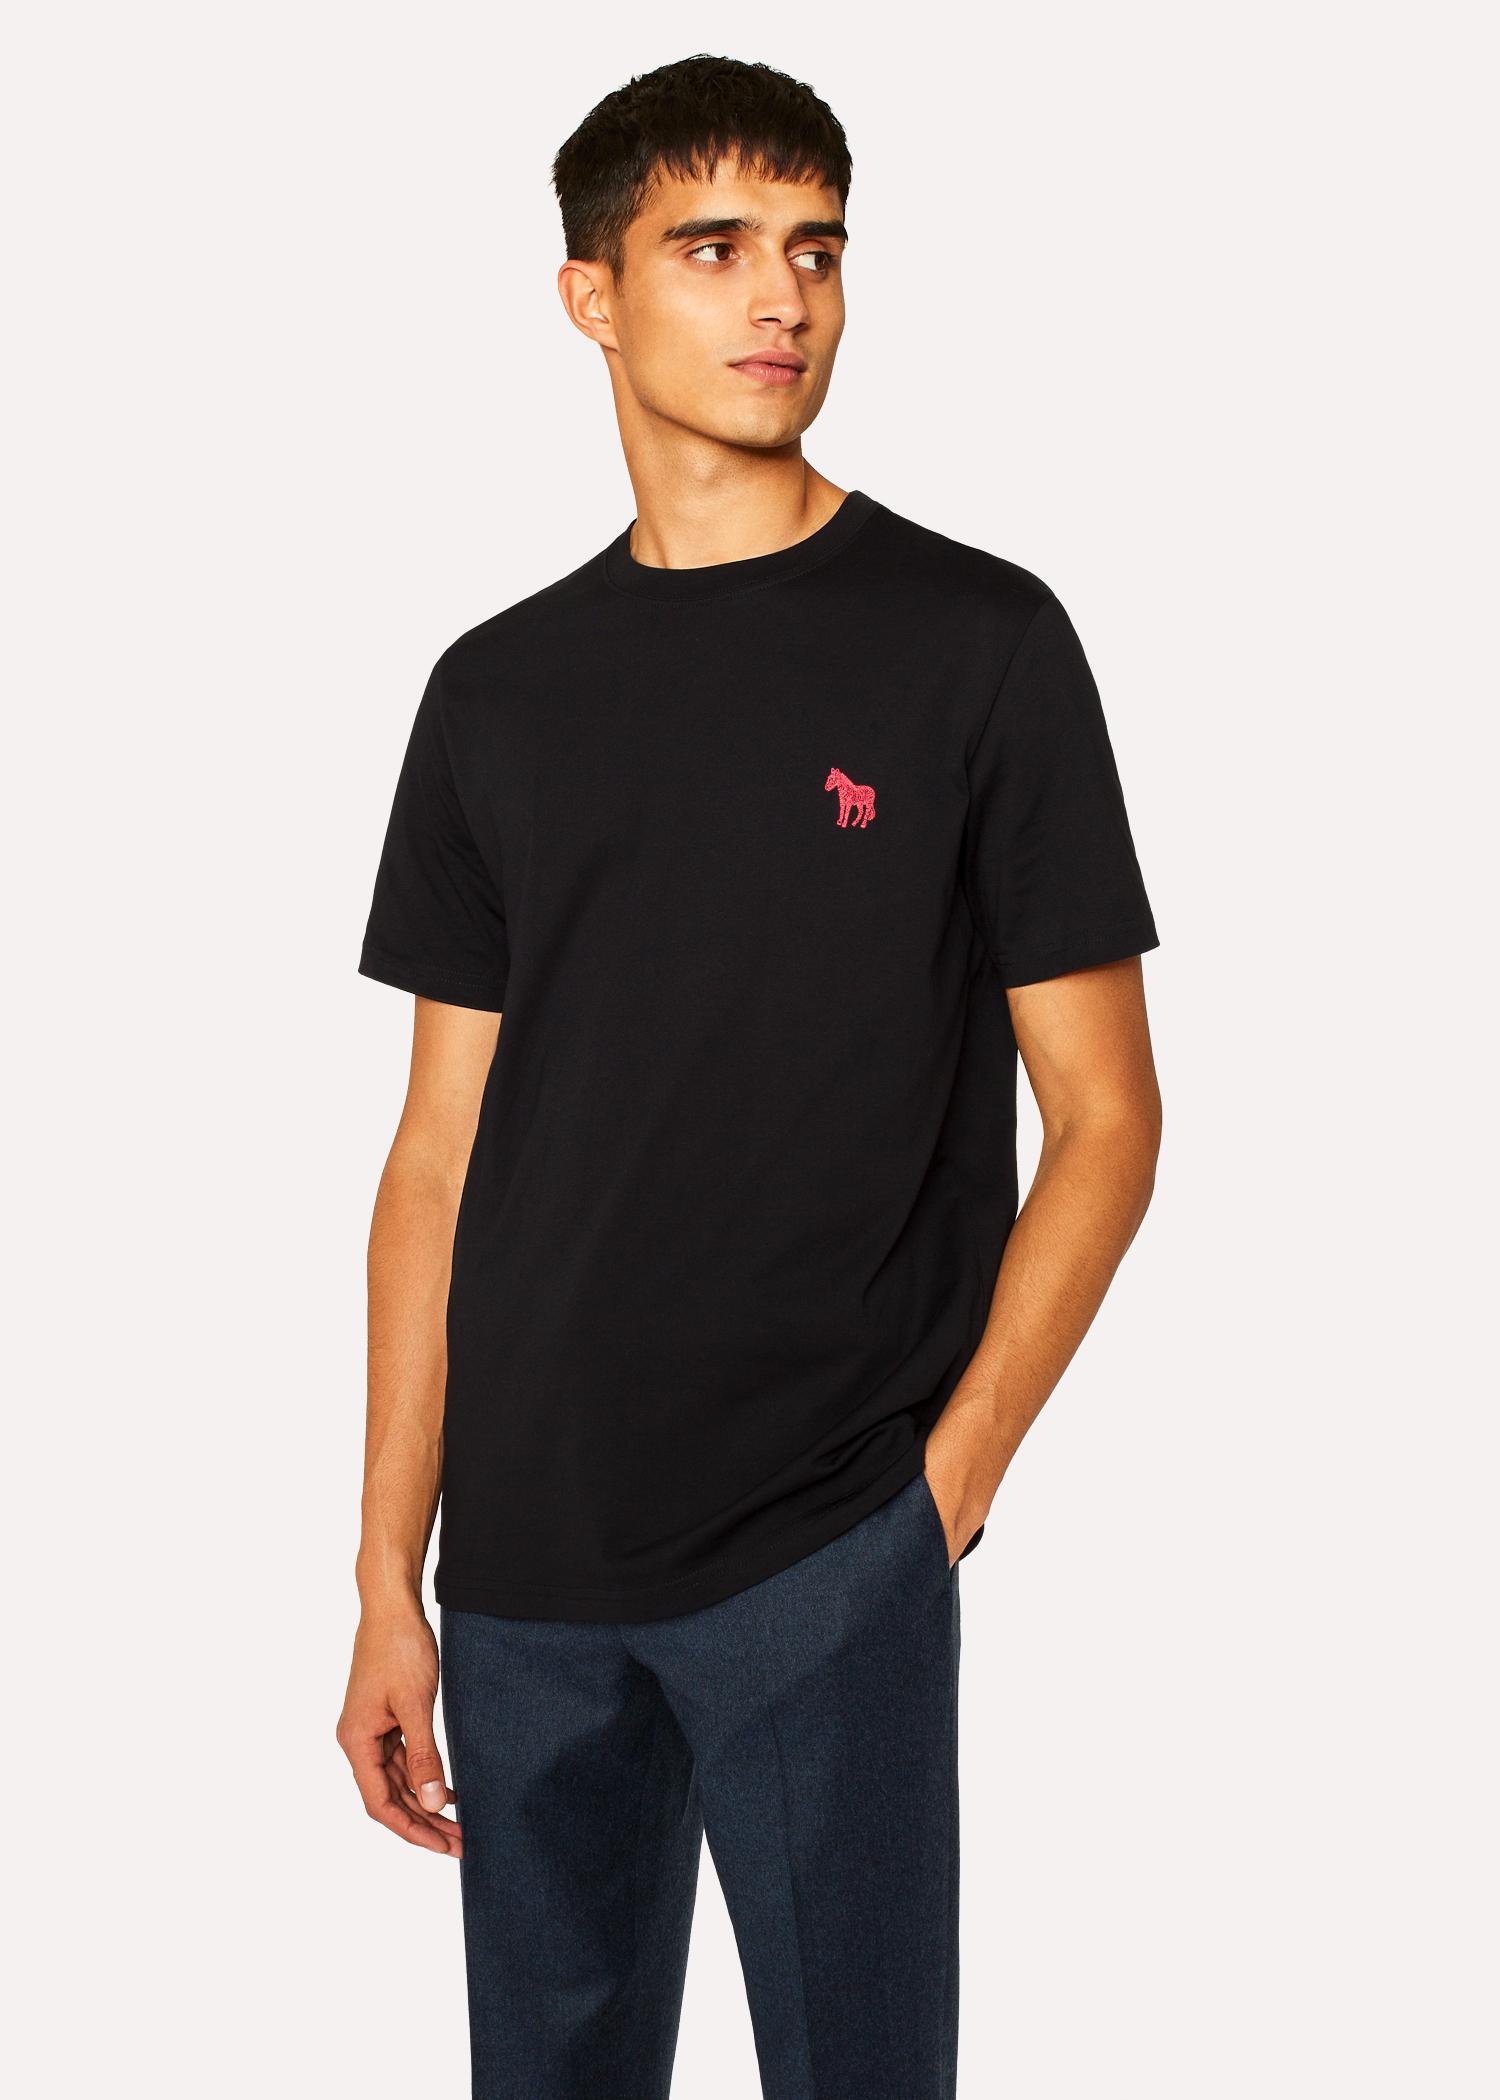 c7623d576904 Men's Black Embroidered Zebra Organic-Cotton T-Shirt - Paul Smith ...